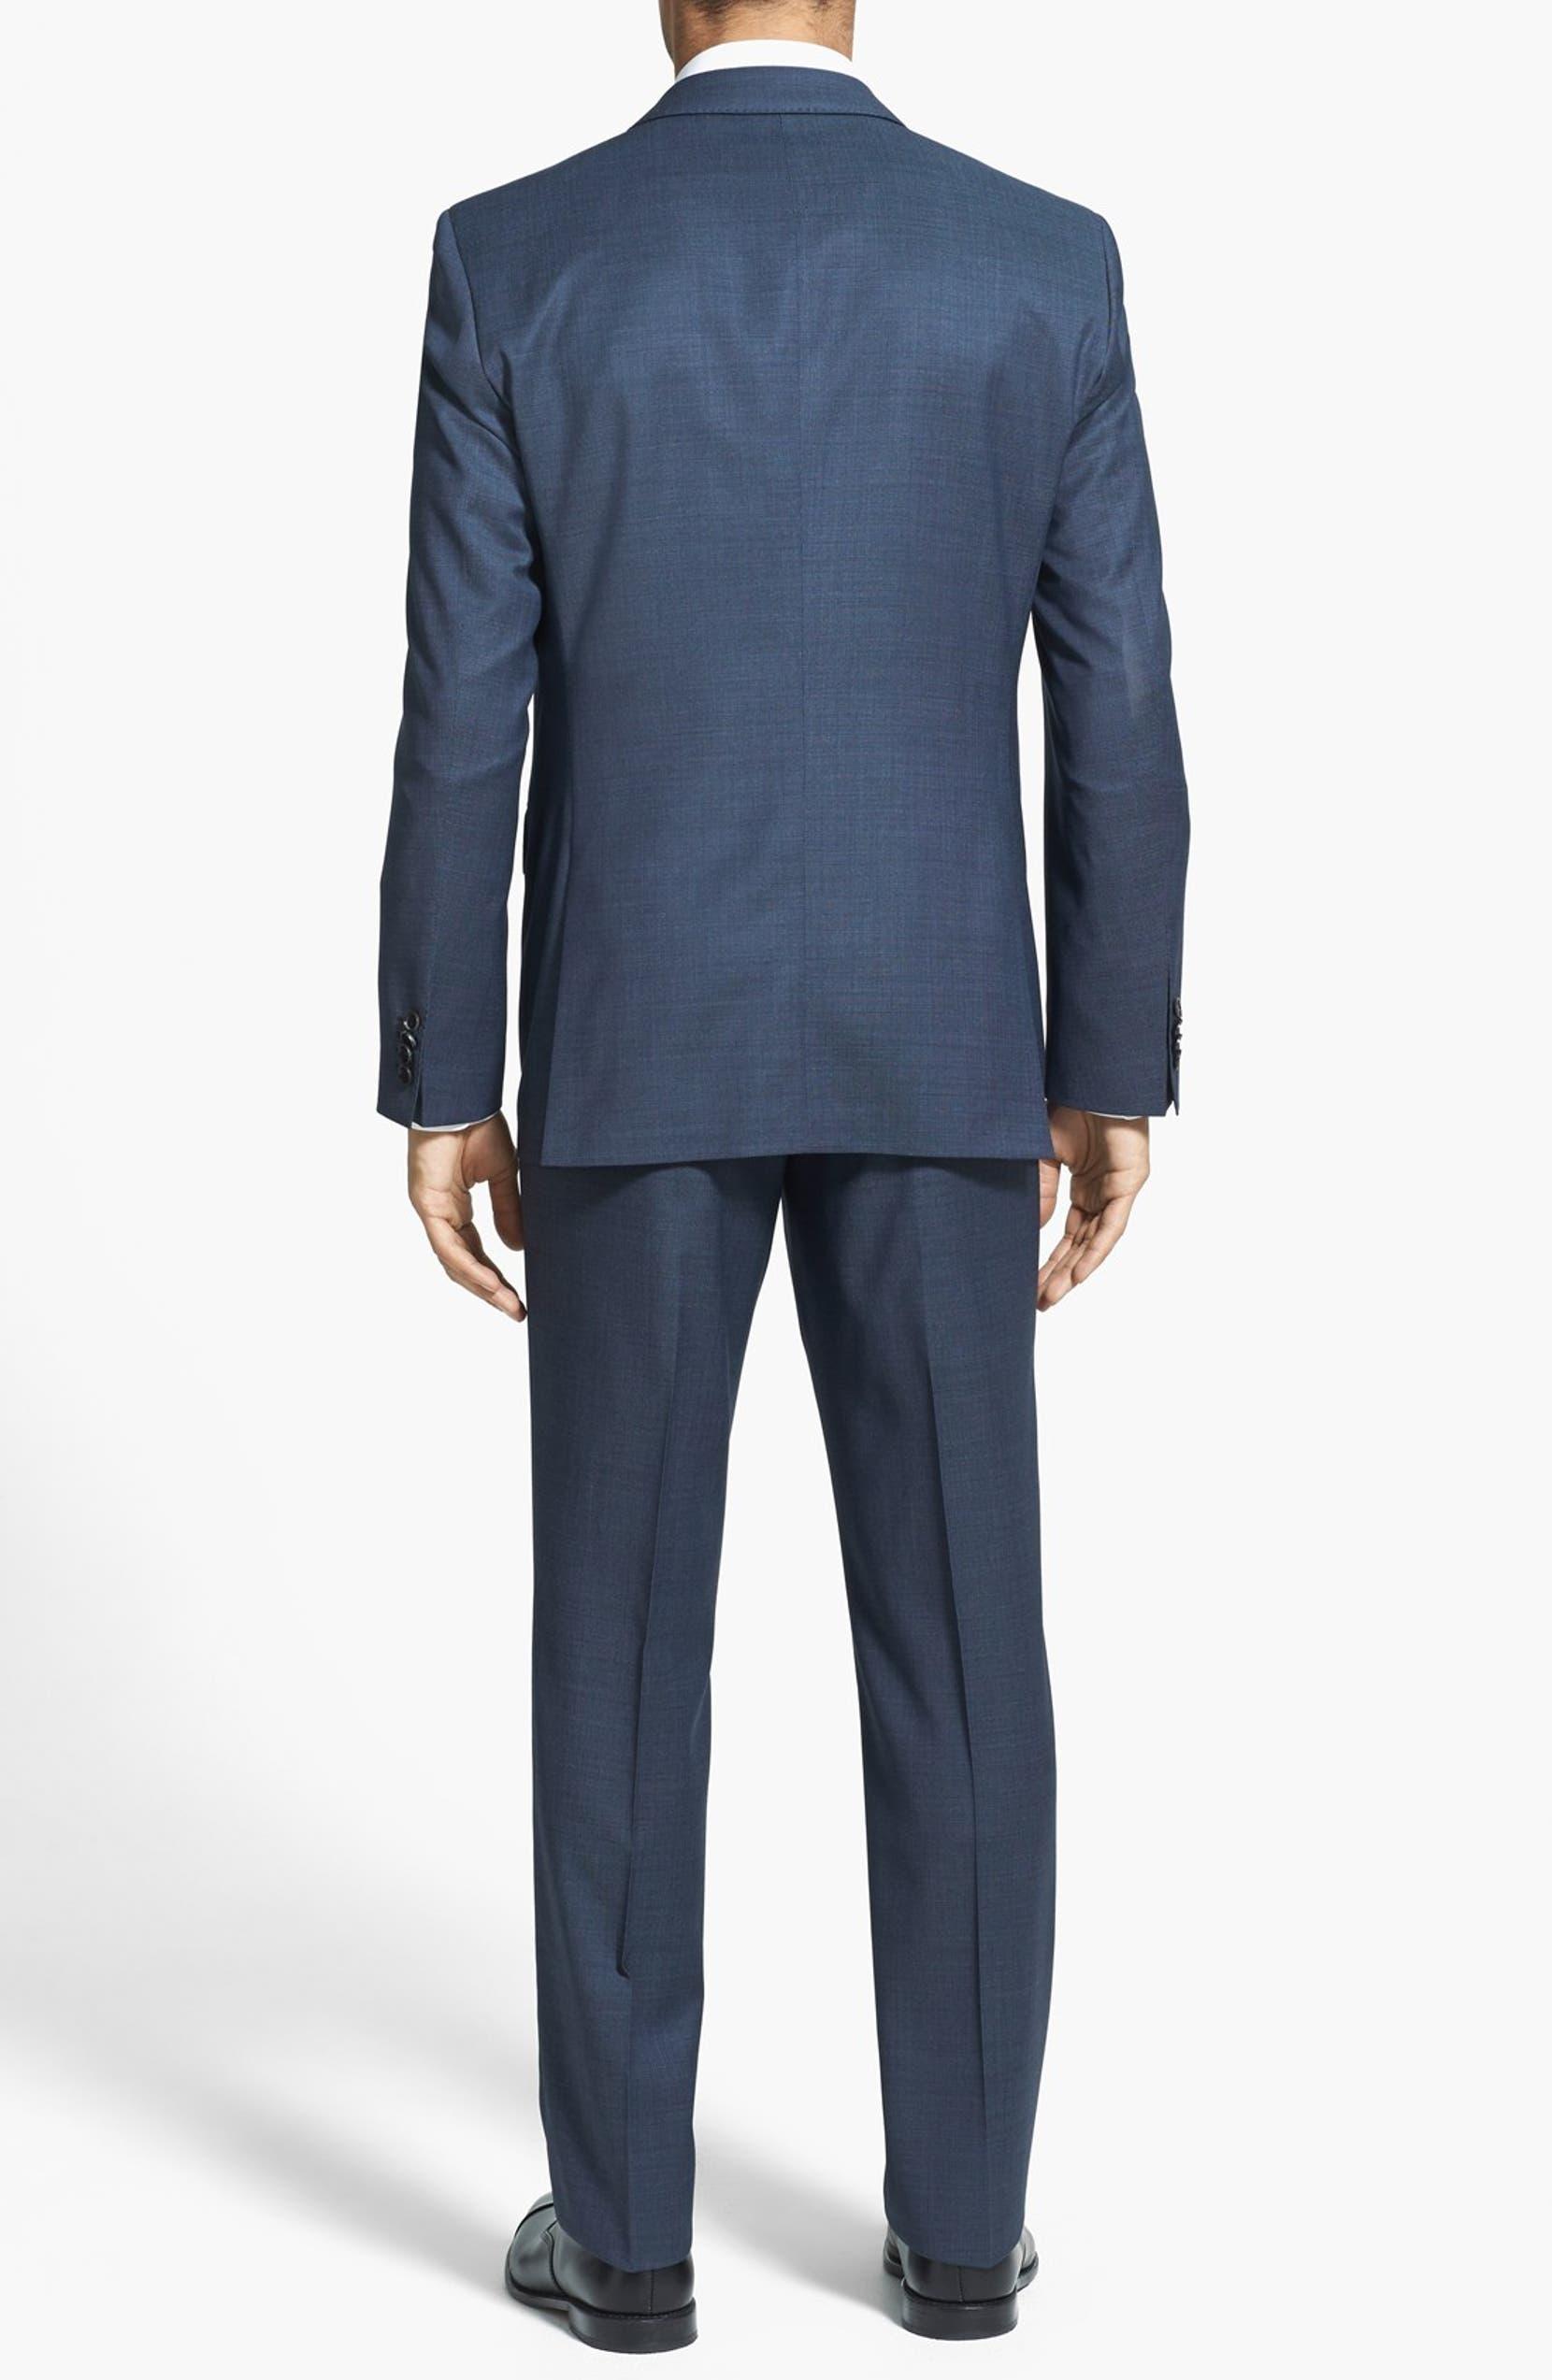 de5c7a182 BOSS HUGO BOSS 'James/Sharp' Trim Fit Wool Suit | Nordstrom